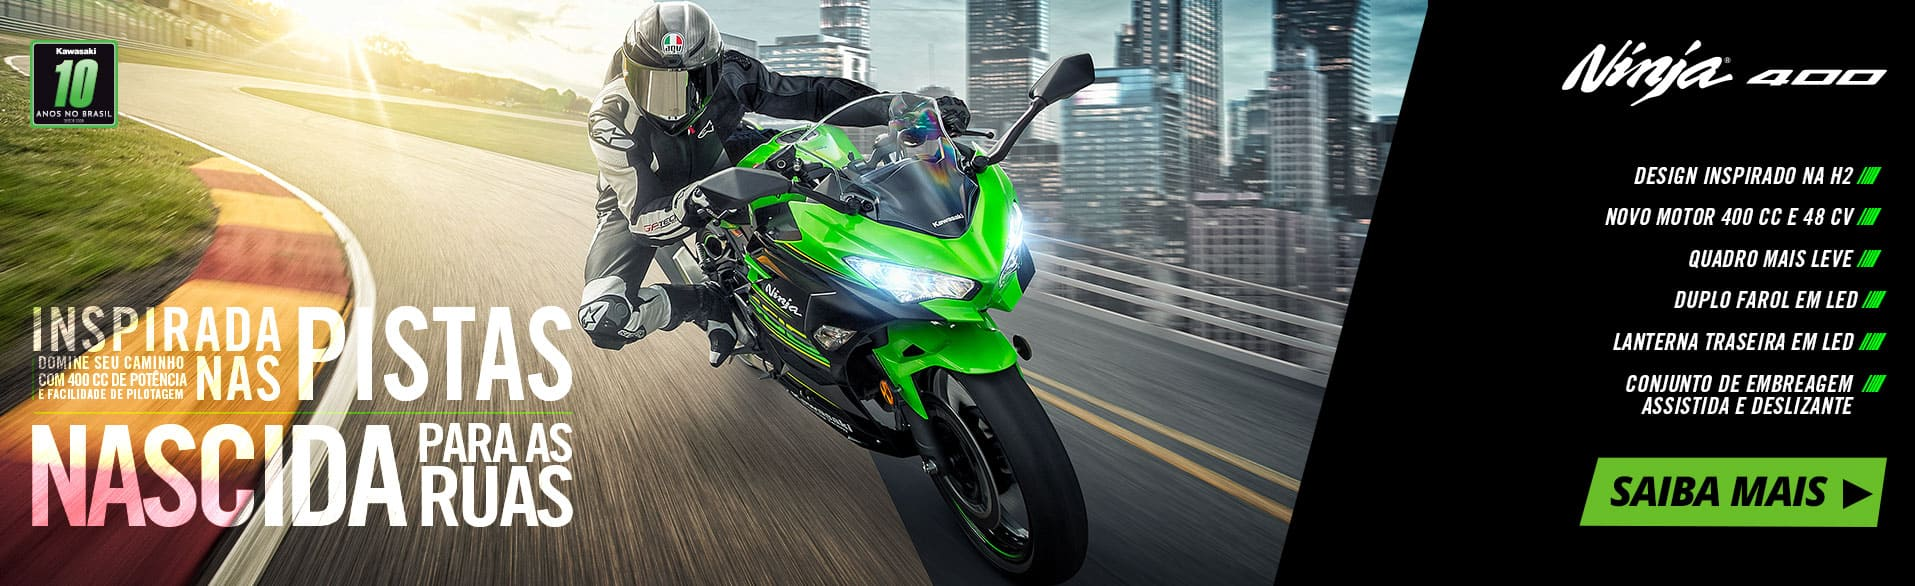 Ninja 400 – Inspirada nas pistas nascida para as ruas